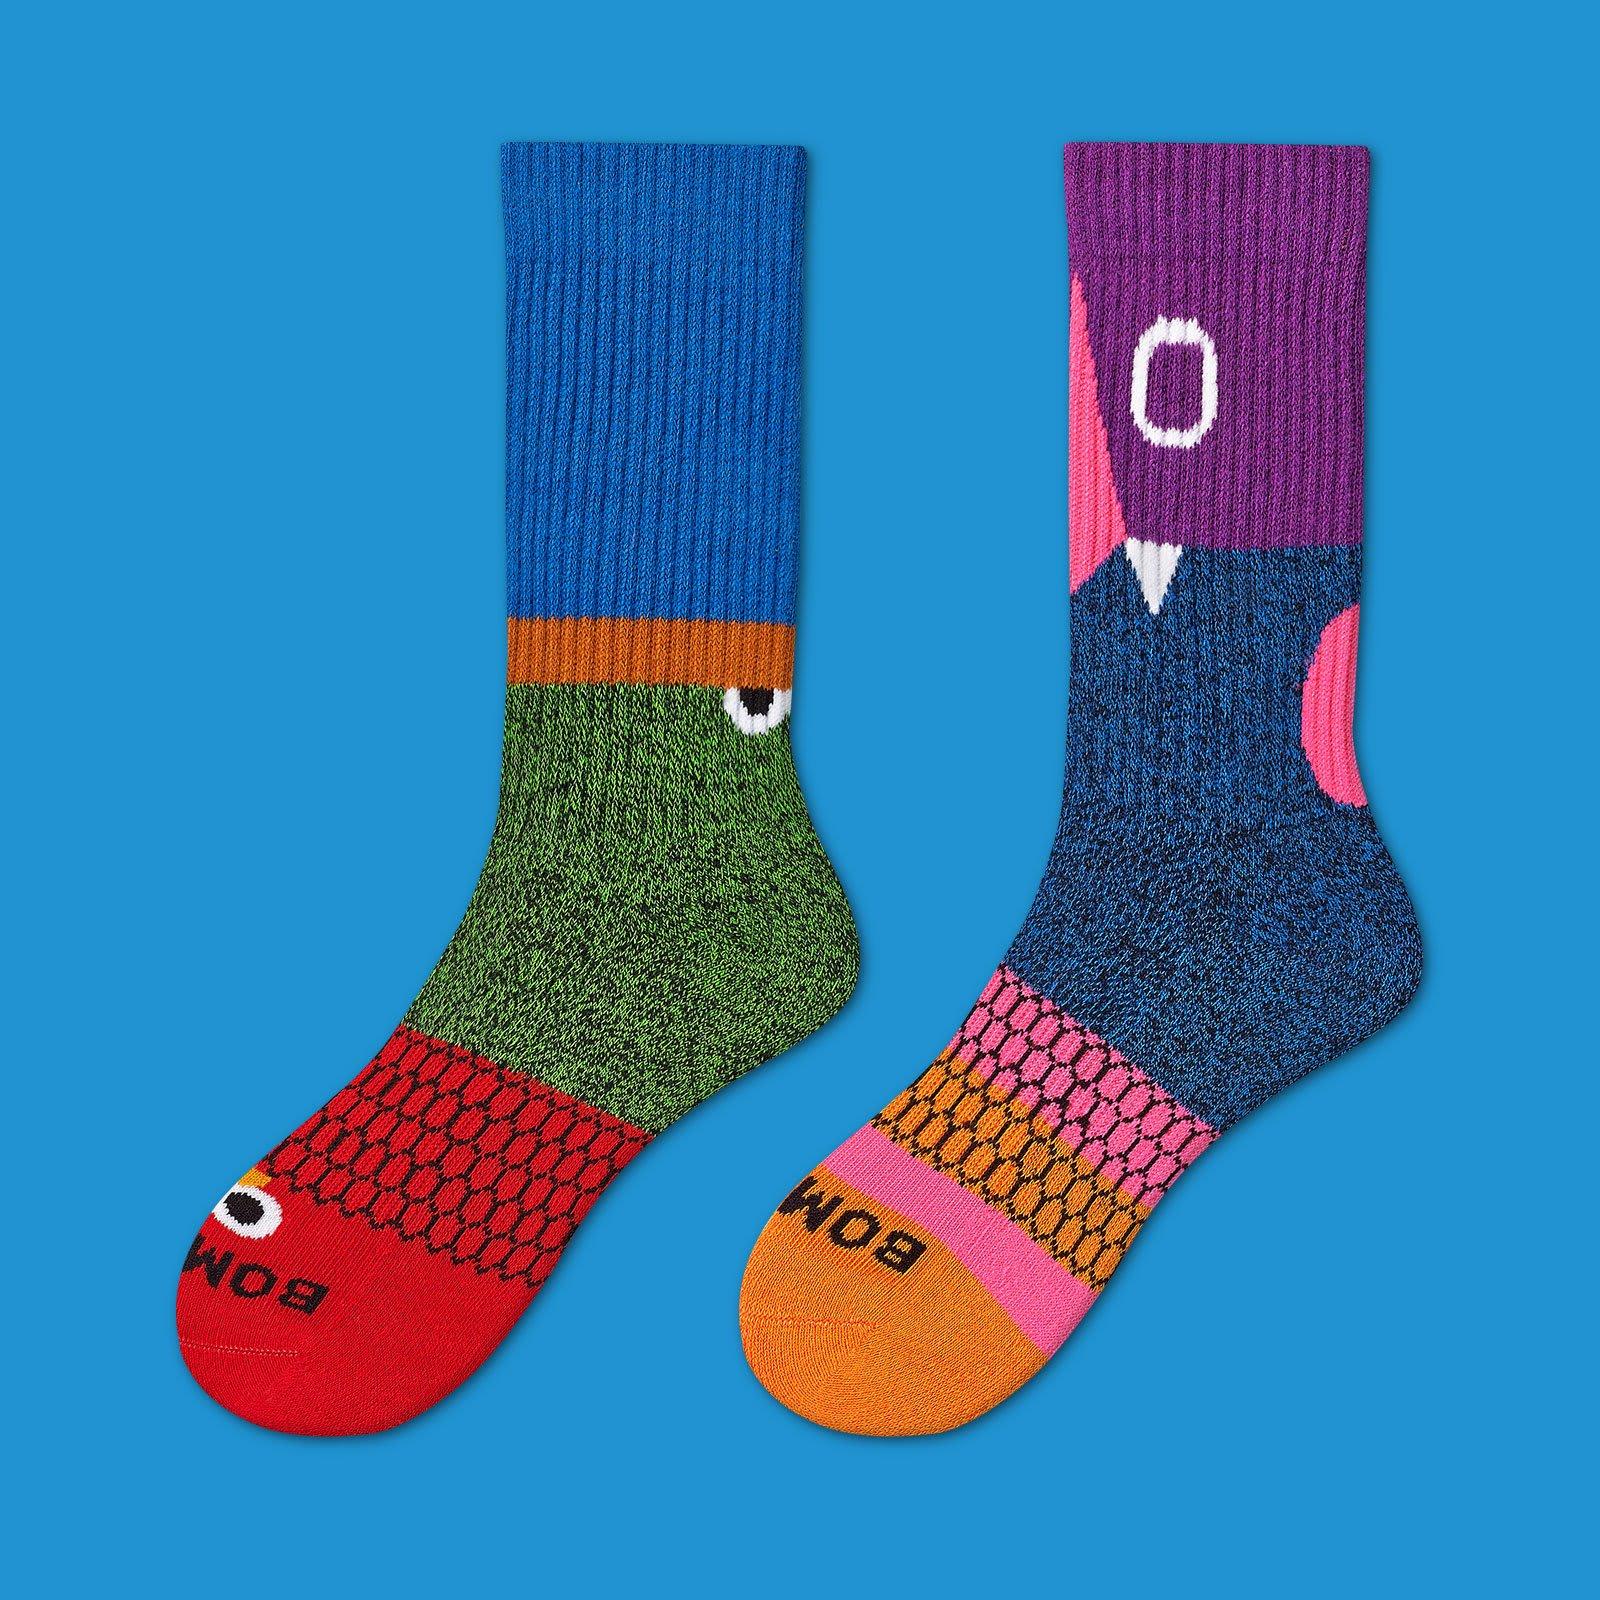 Men's Sesame Street 50th Anniversary Colorblock Calf Socks by Bombas